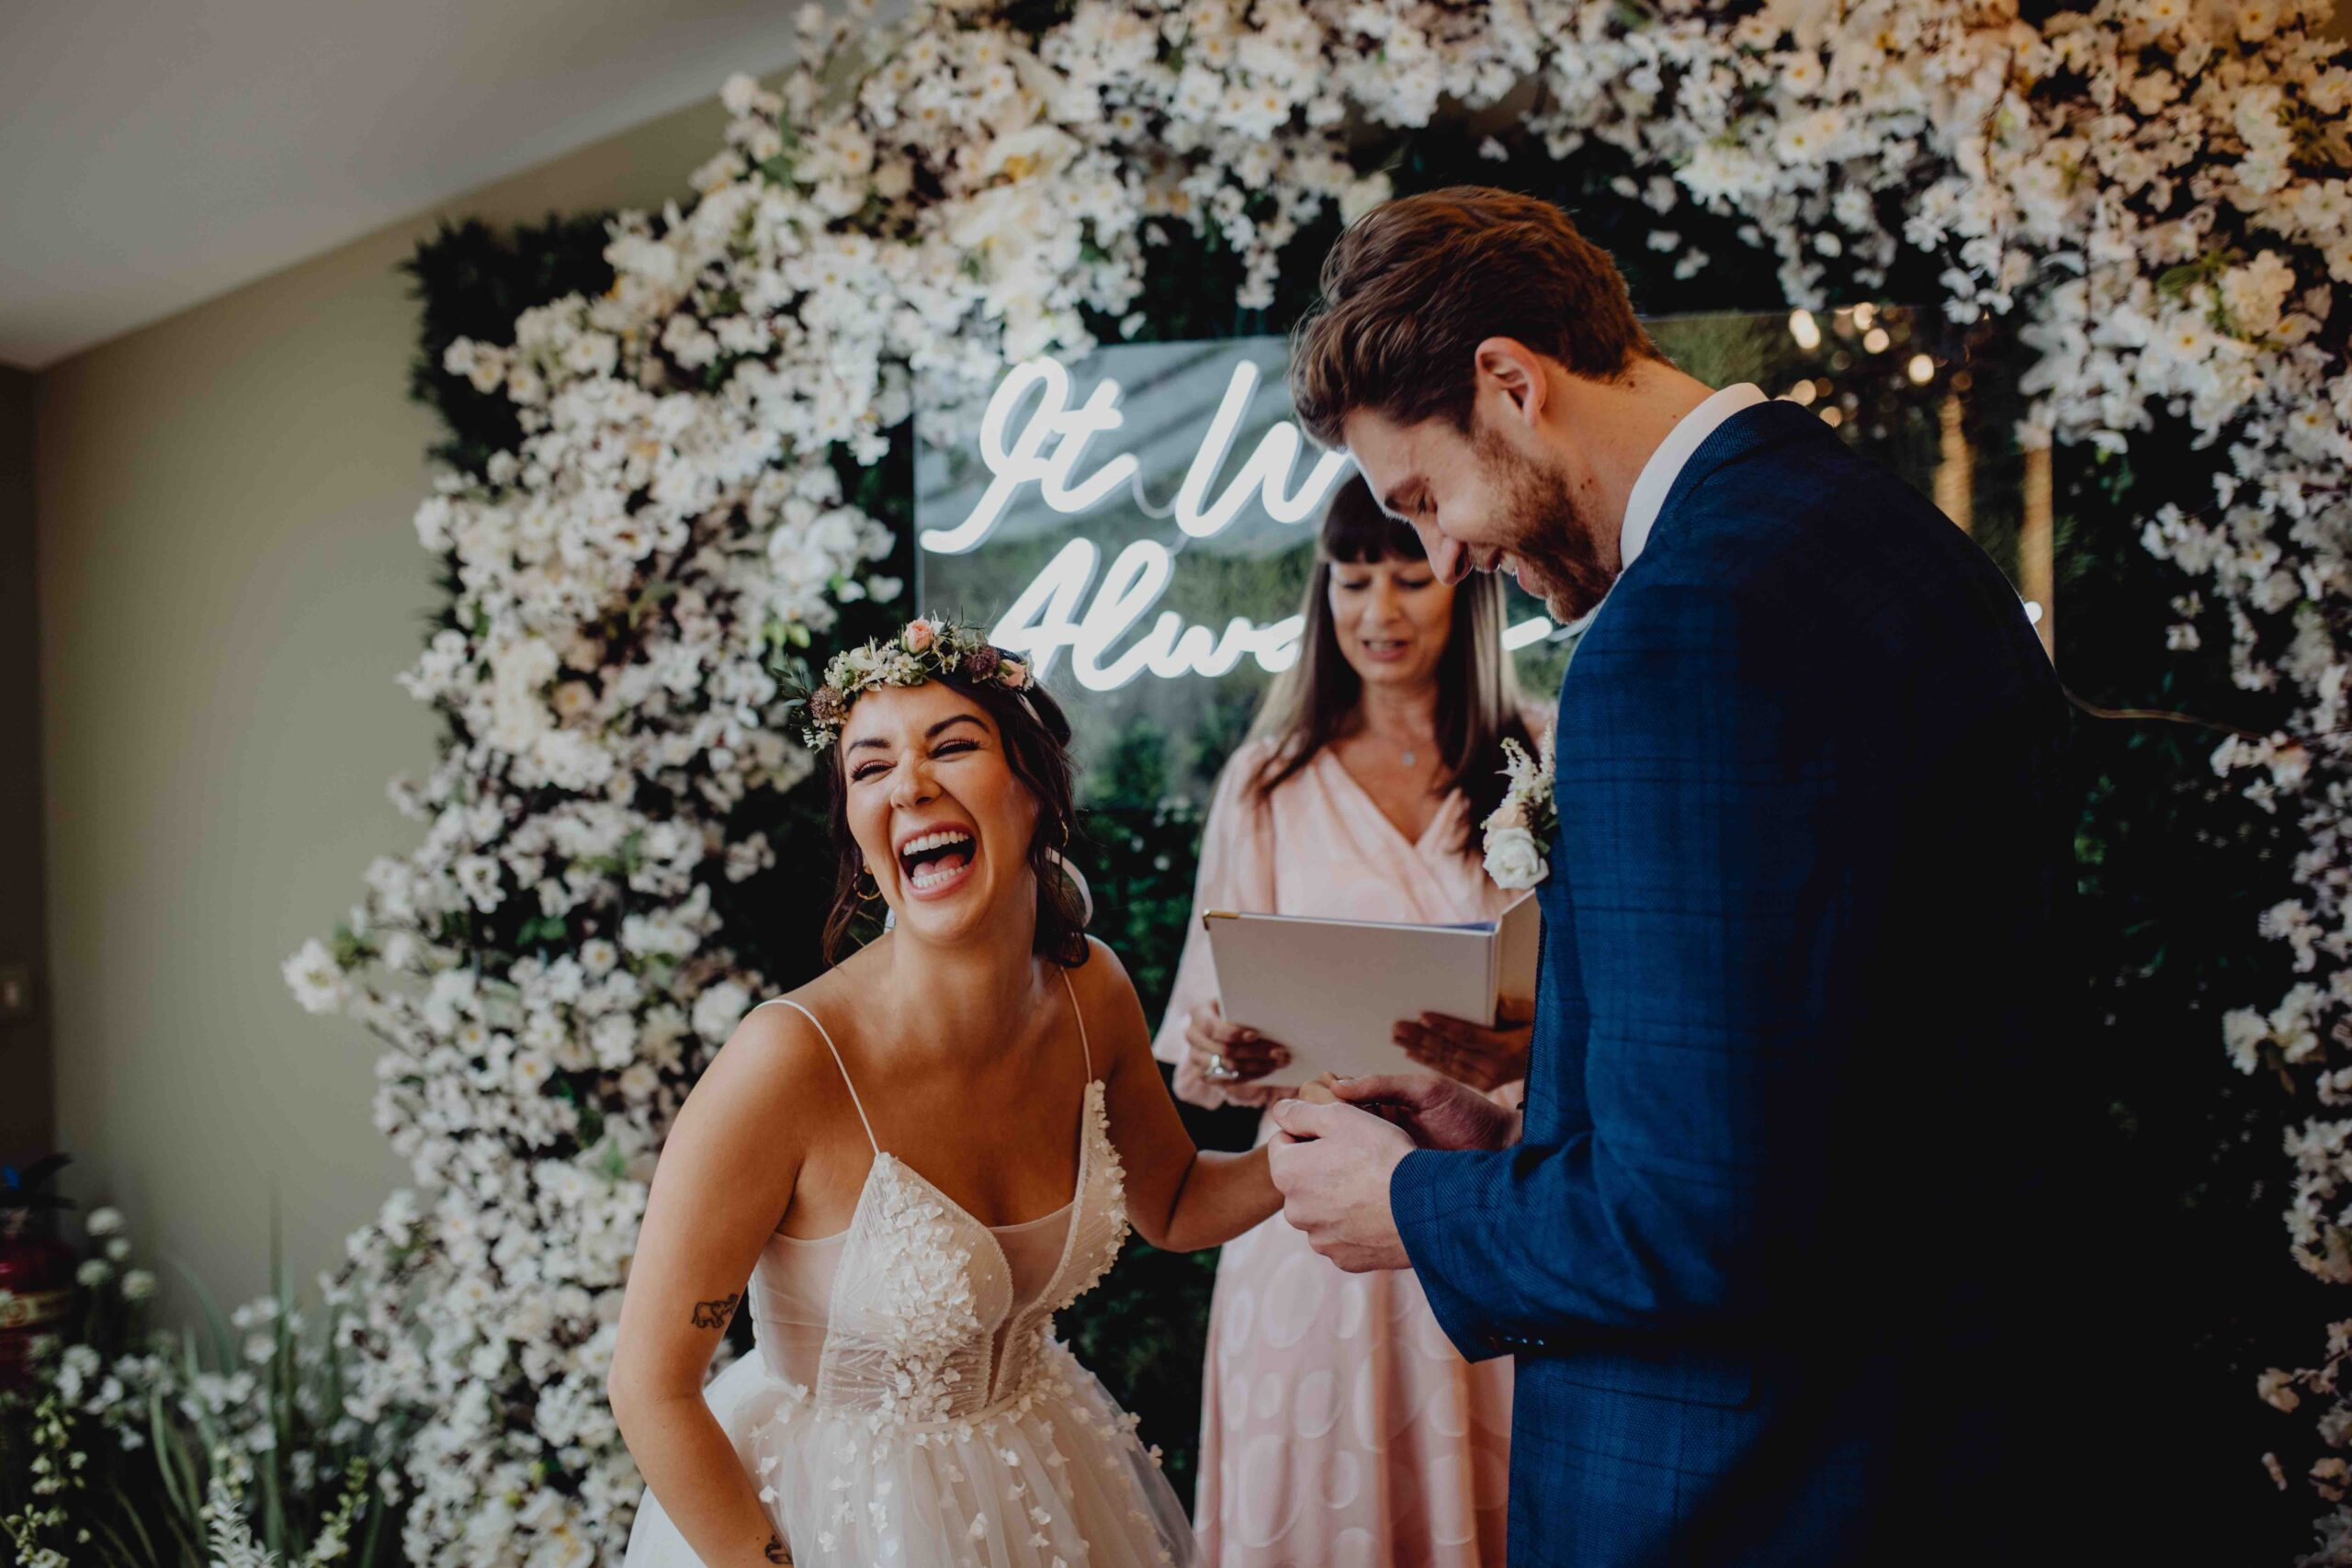 Celebrant officiates boho wedding